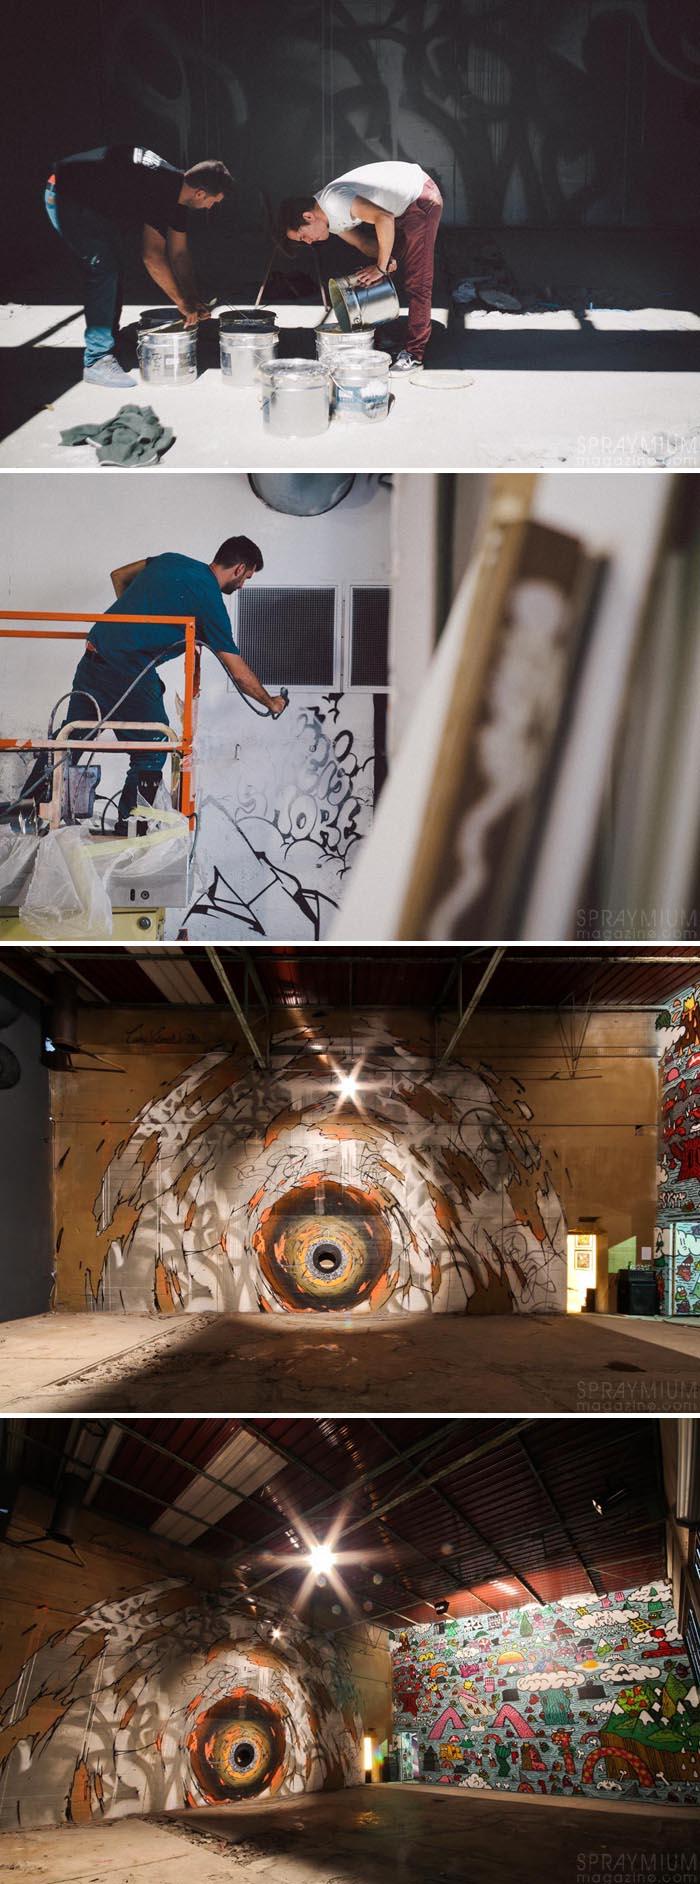 exposition mister freeze toulouse art urbain contemporain graffiti postgraffiti streetart muralism spraymium reso